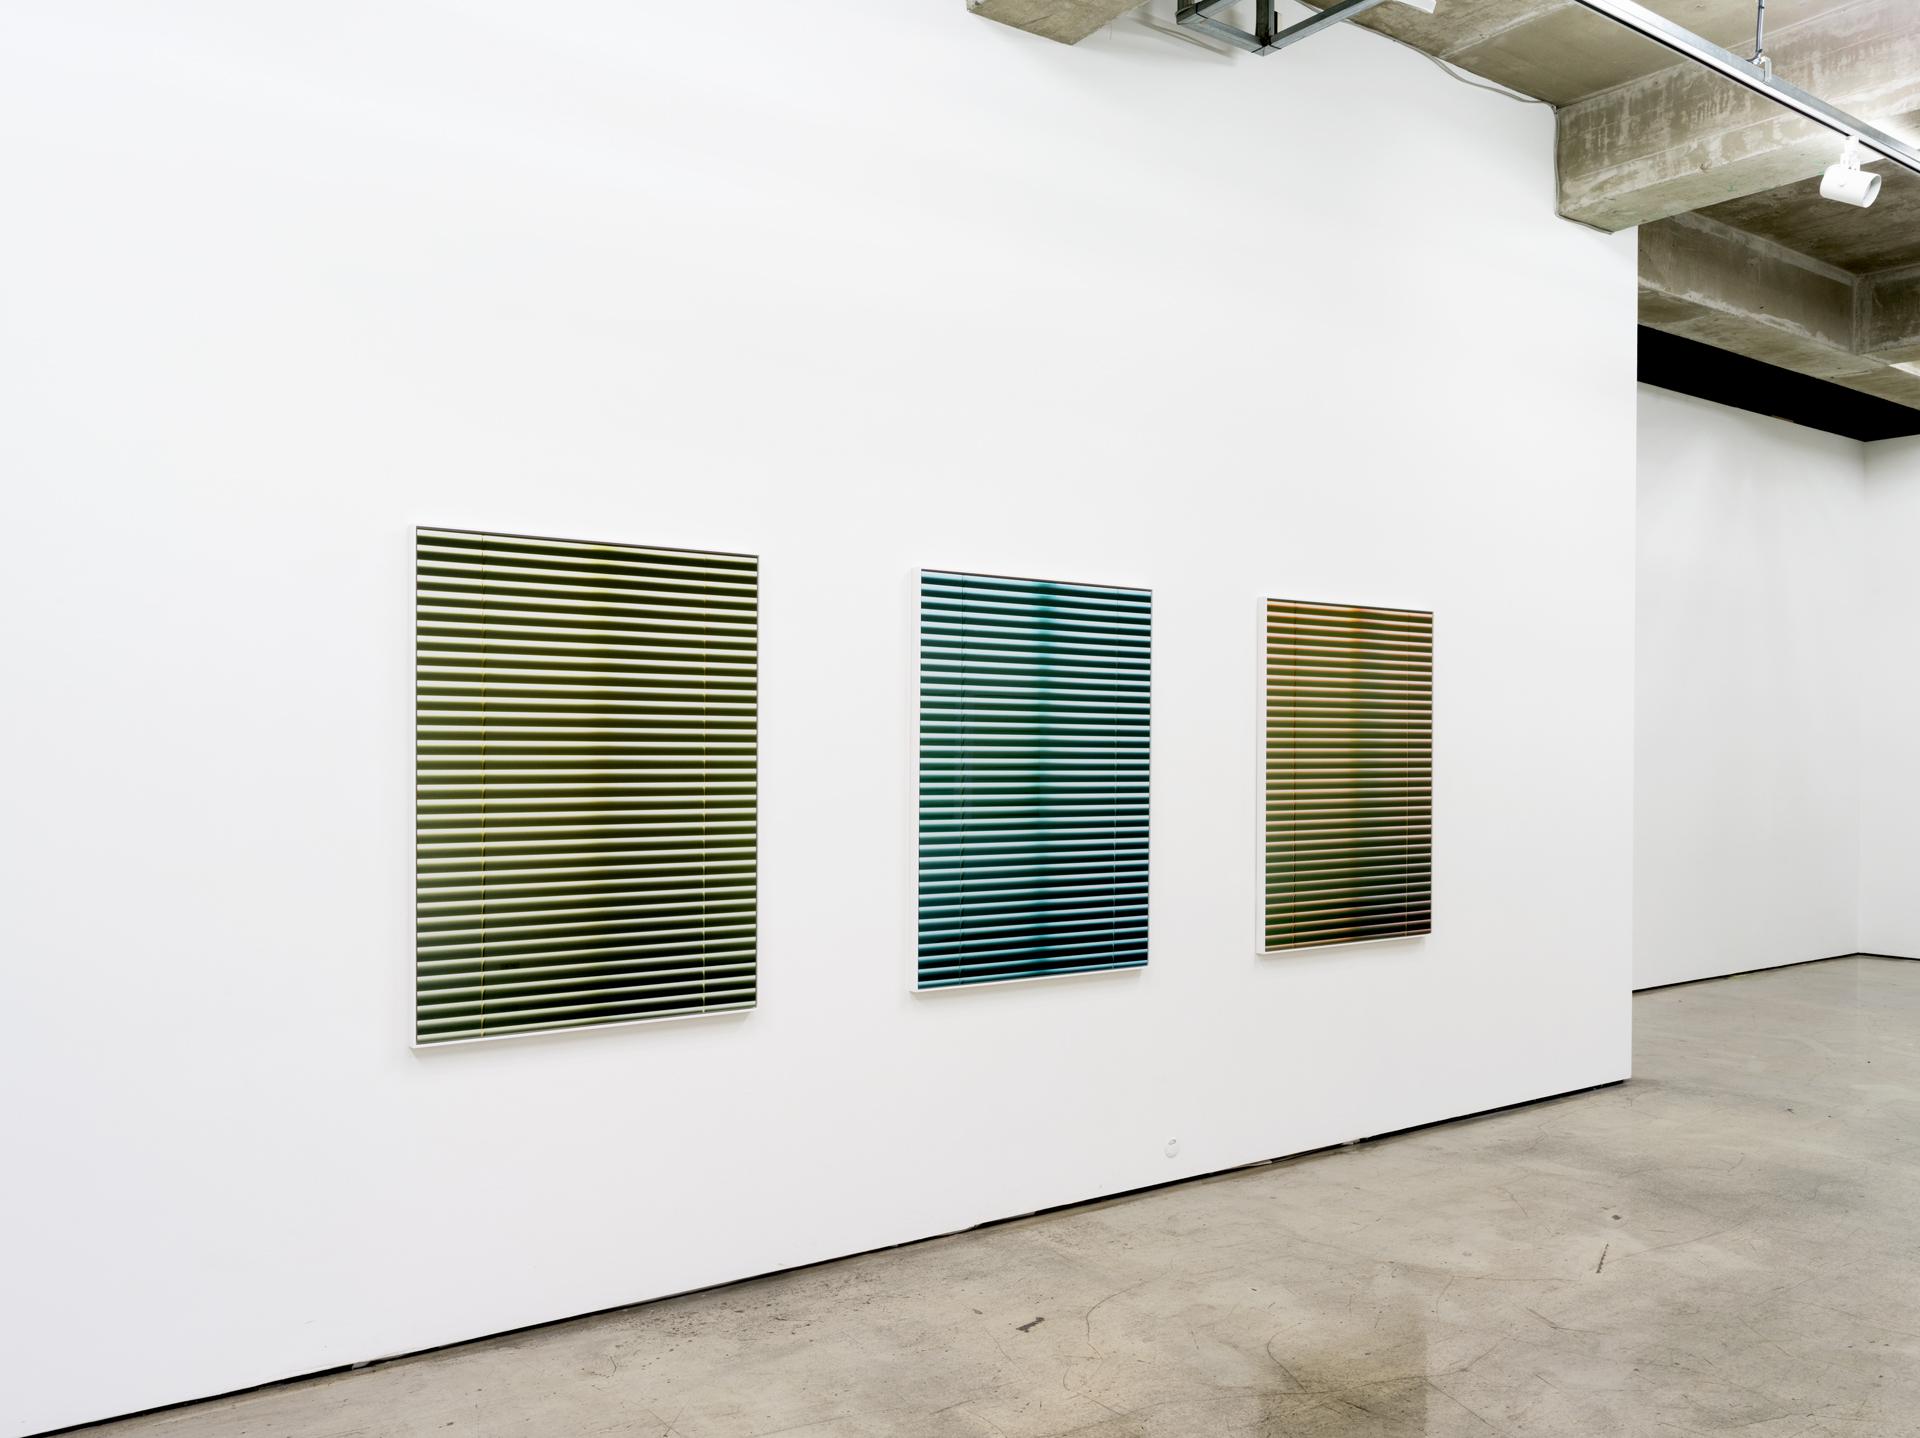 2016, Bundo Gallery 03